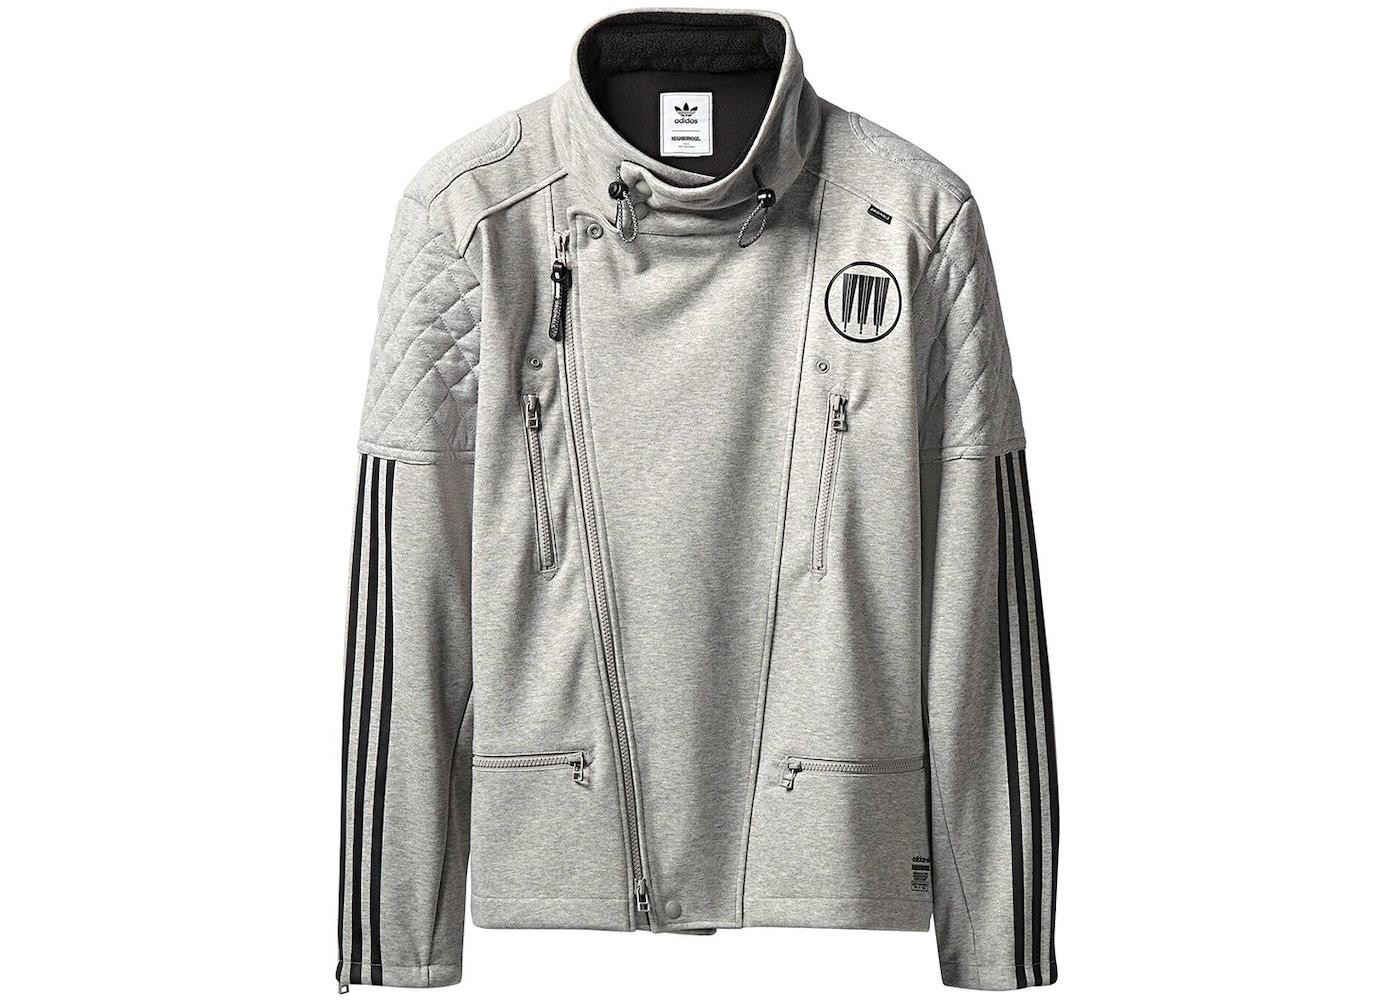 2c7d2ddca9a2 adidas Neighborhood Riders Track Jacket Grey - SS18